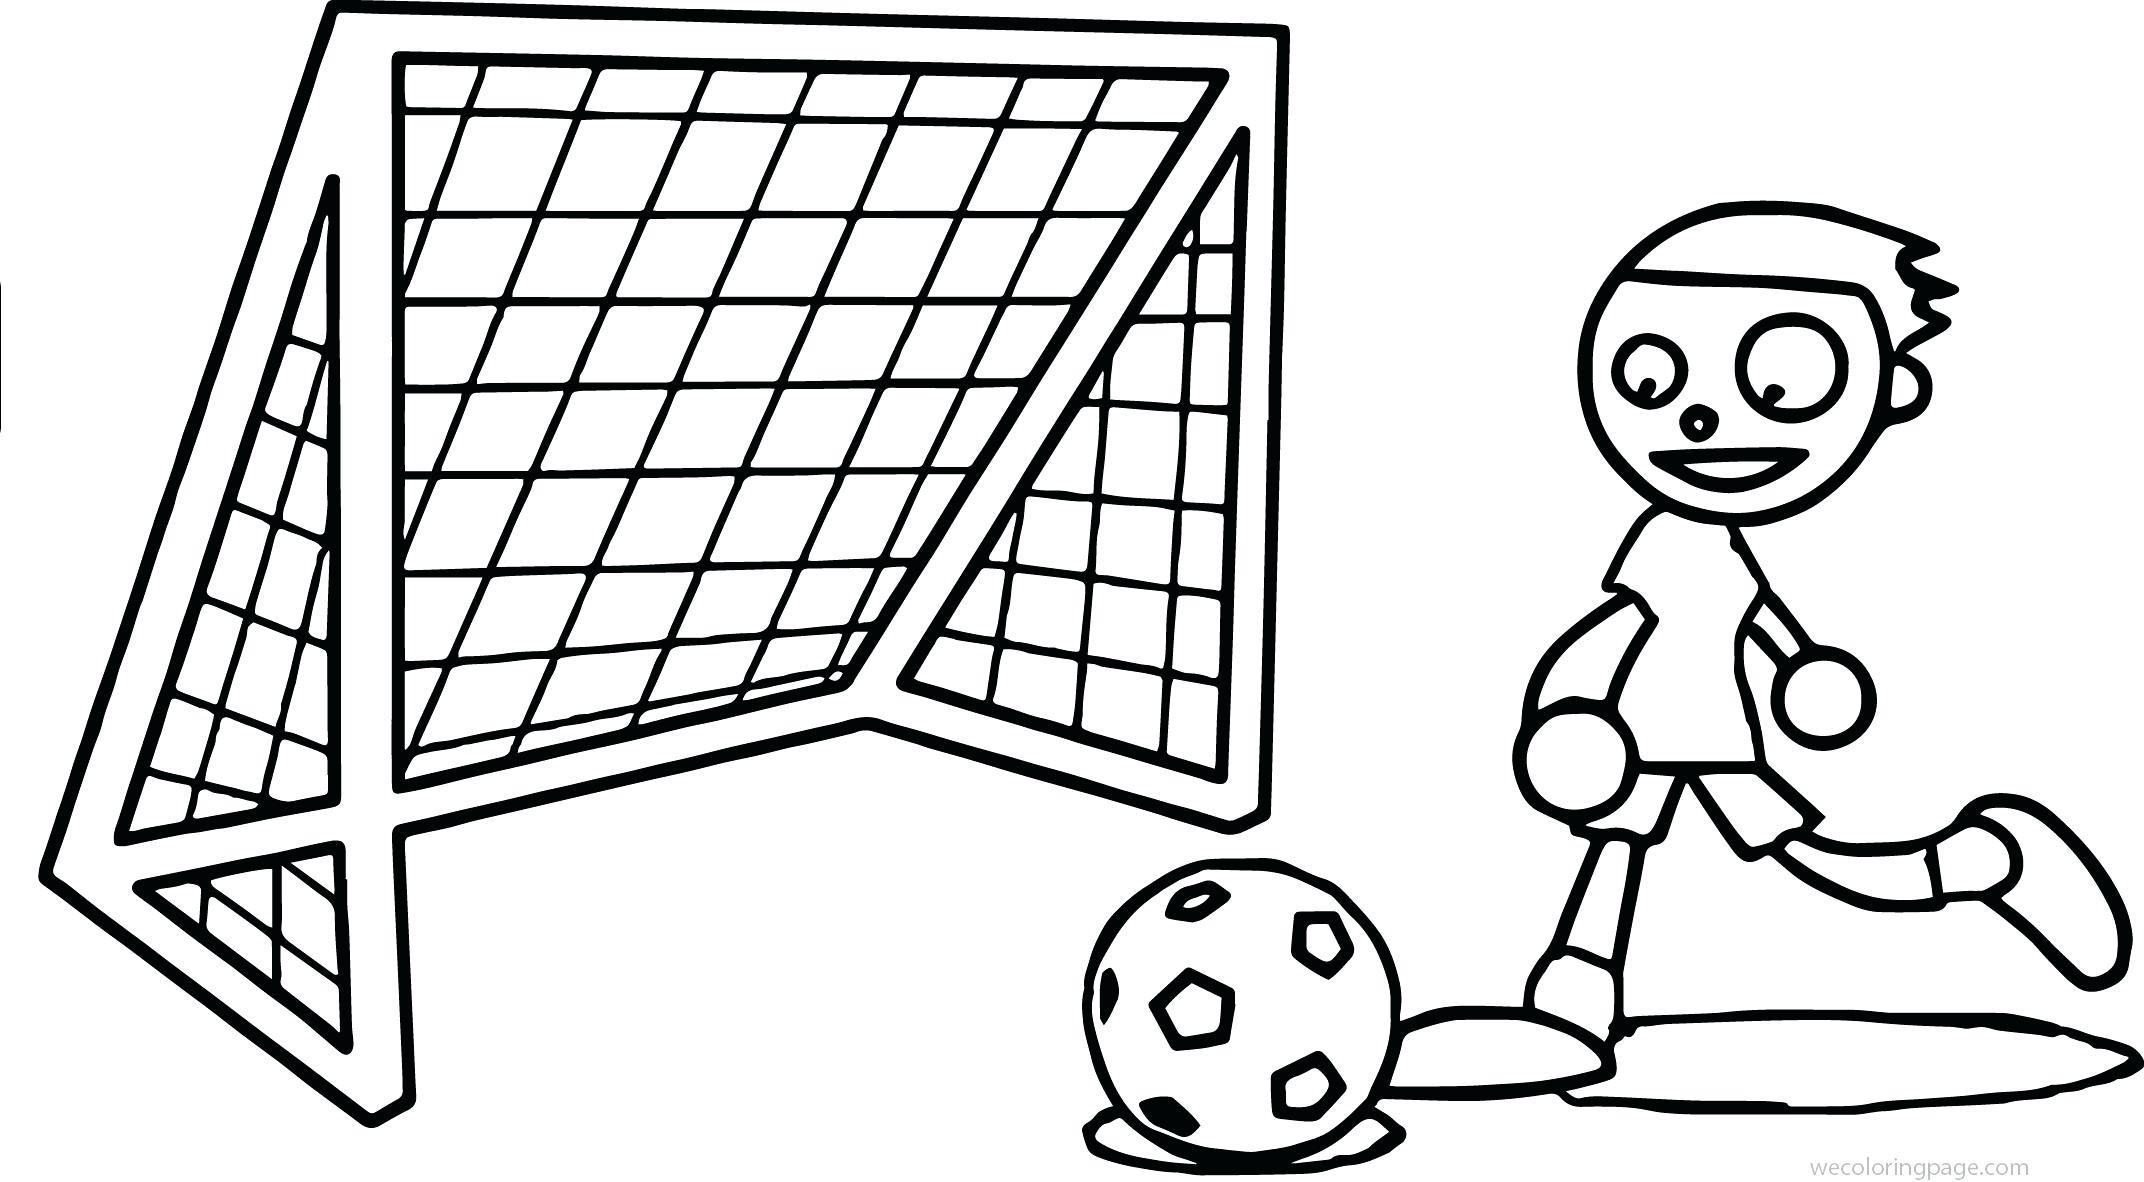 Soccer Net Drawing At Getdrawings